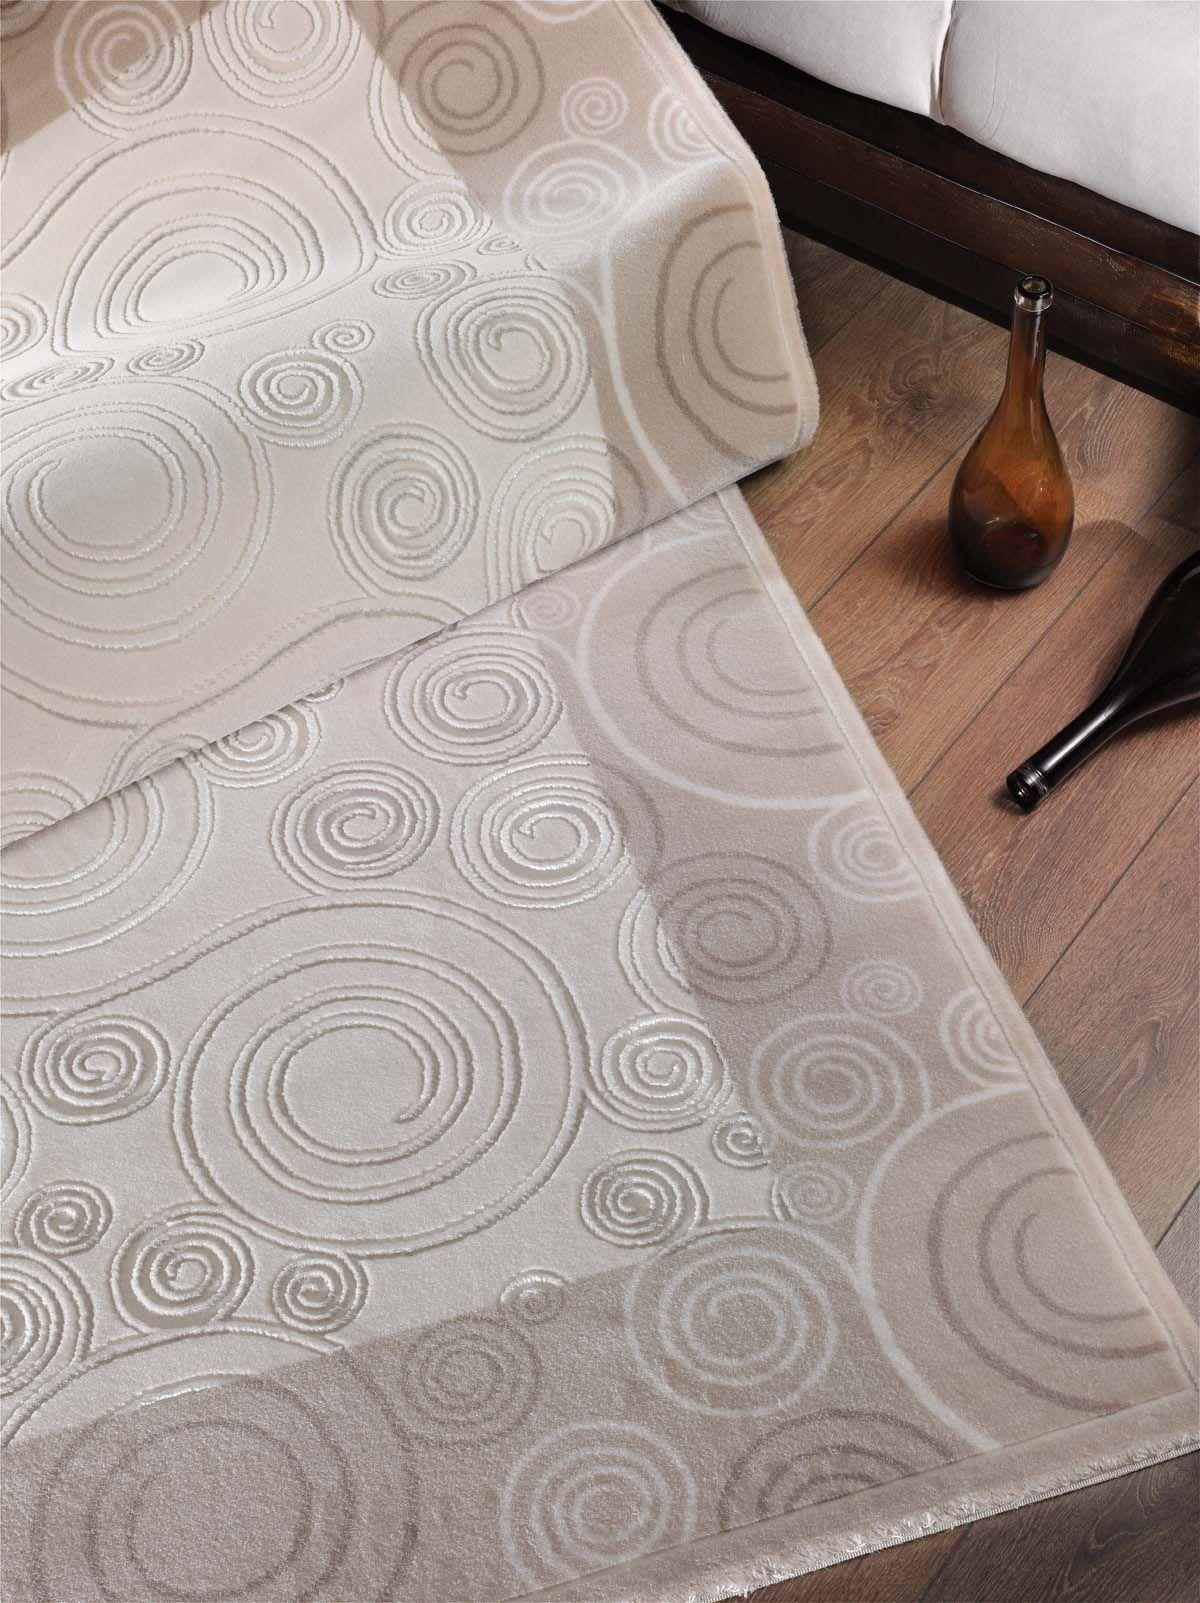 www halidenizi com halidenizi halidenizi halidenizi halidenizi ozel tasarim halilar en yeni hali modelleri en uygun hali mode free motion quilting quilts rugs